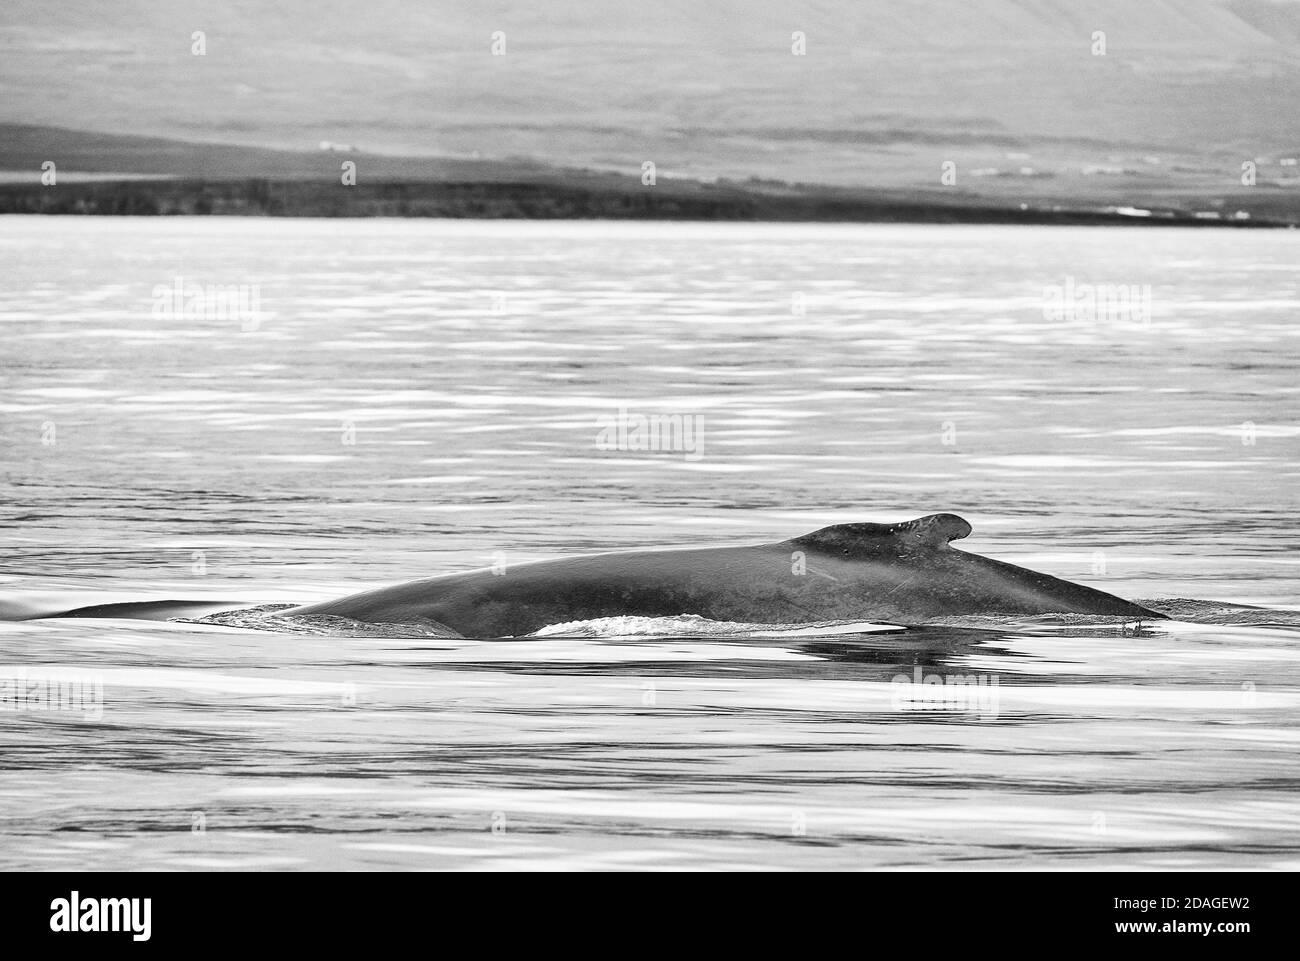 Observation des baleines à Husavik, dans le nord de l'Islande, en Europe Banque D'Images